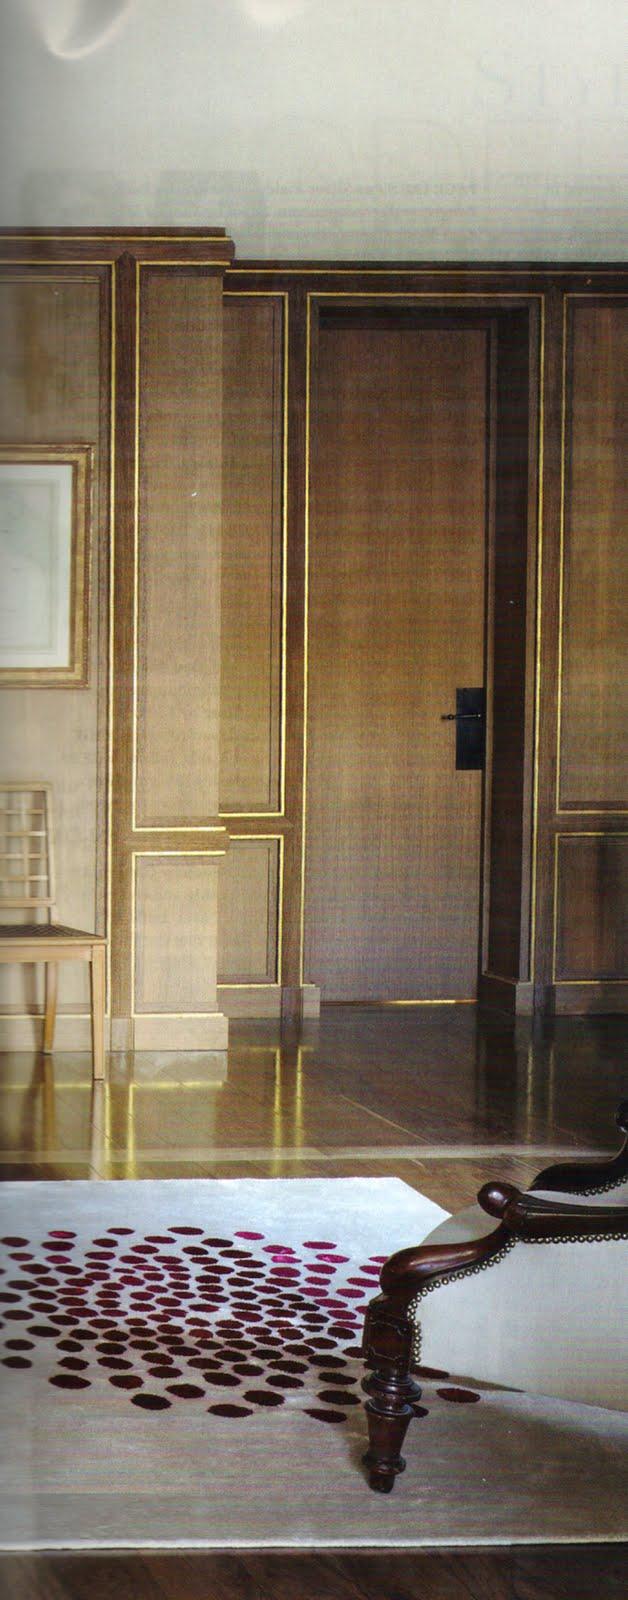 Splendid Sass Jacques Grange Interior Design In London